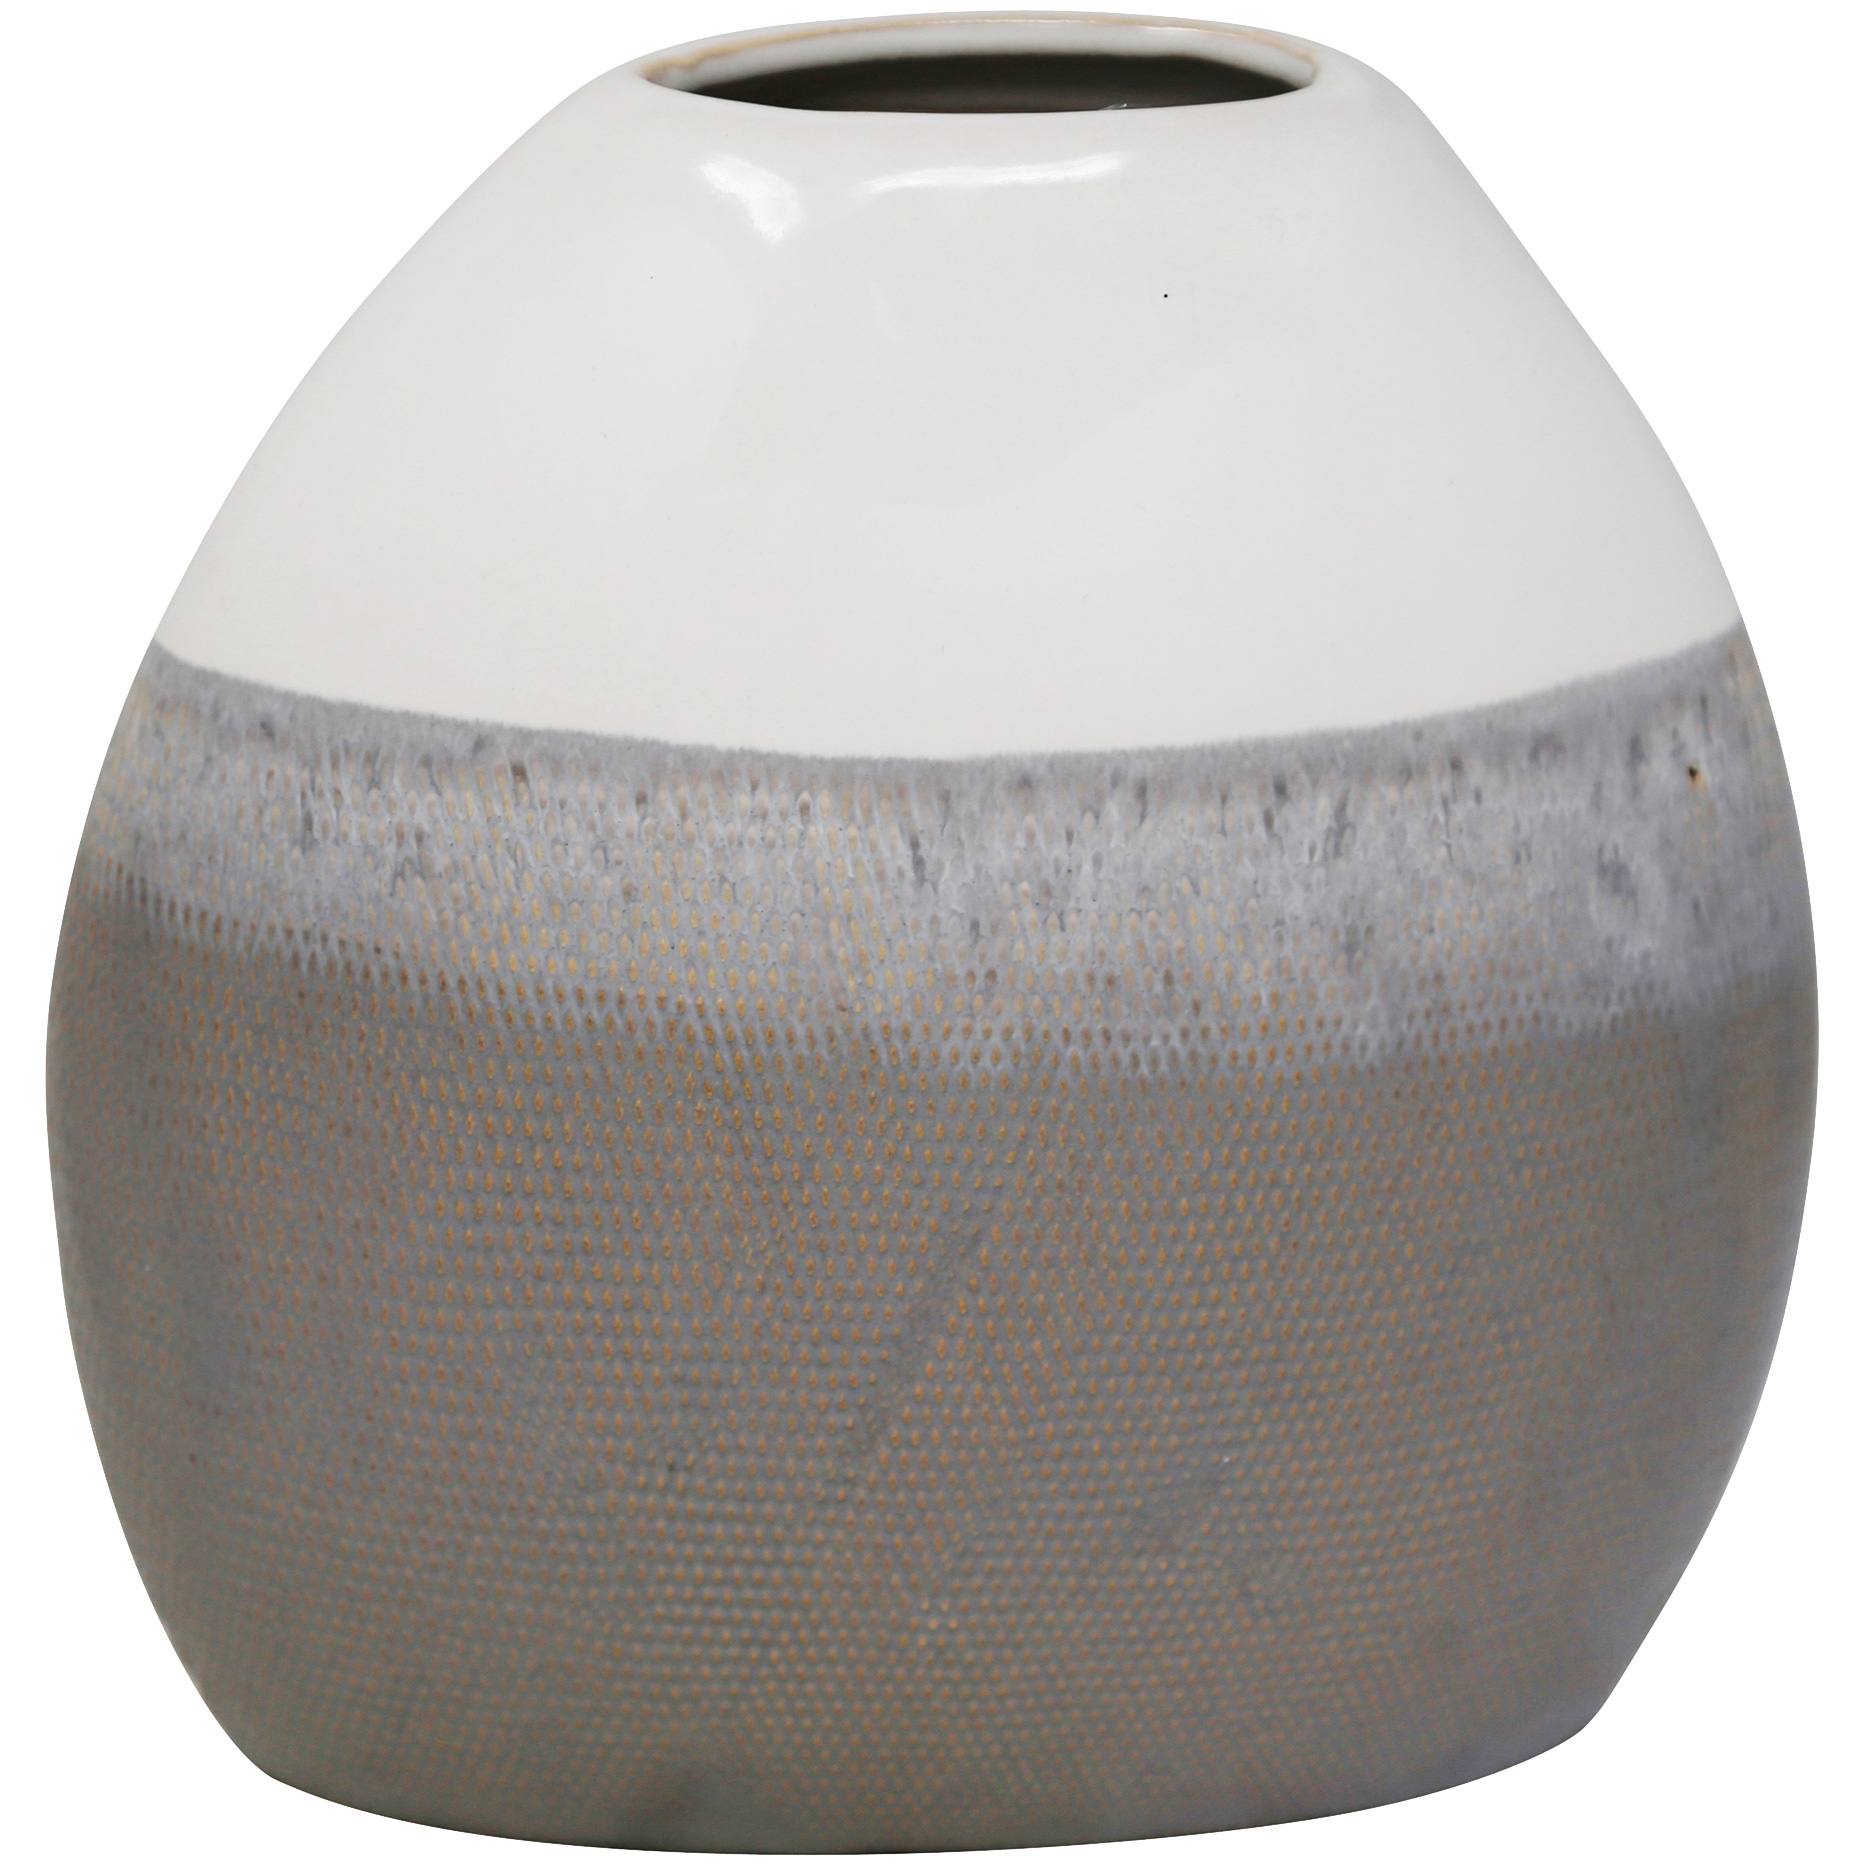 Sagebrook | Elevated Chic Gray Small Ceramic Vase